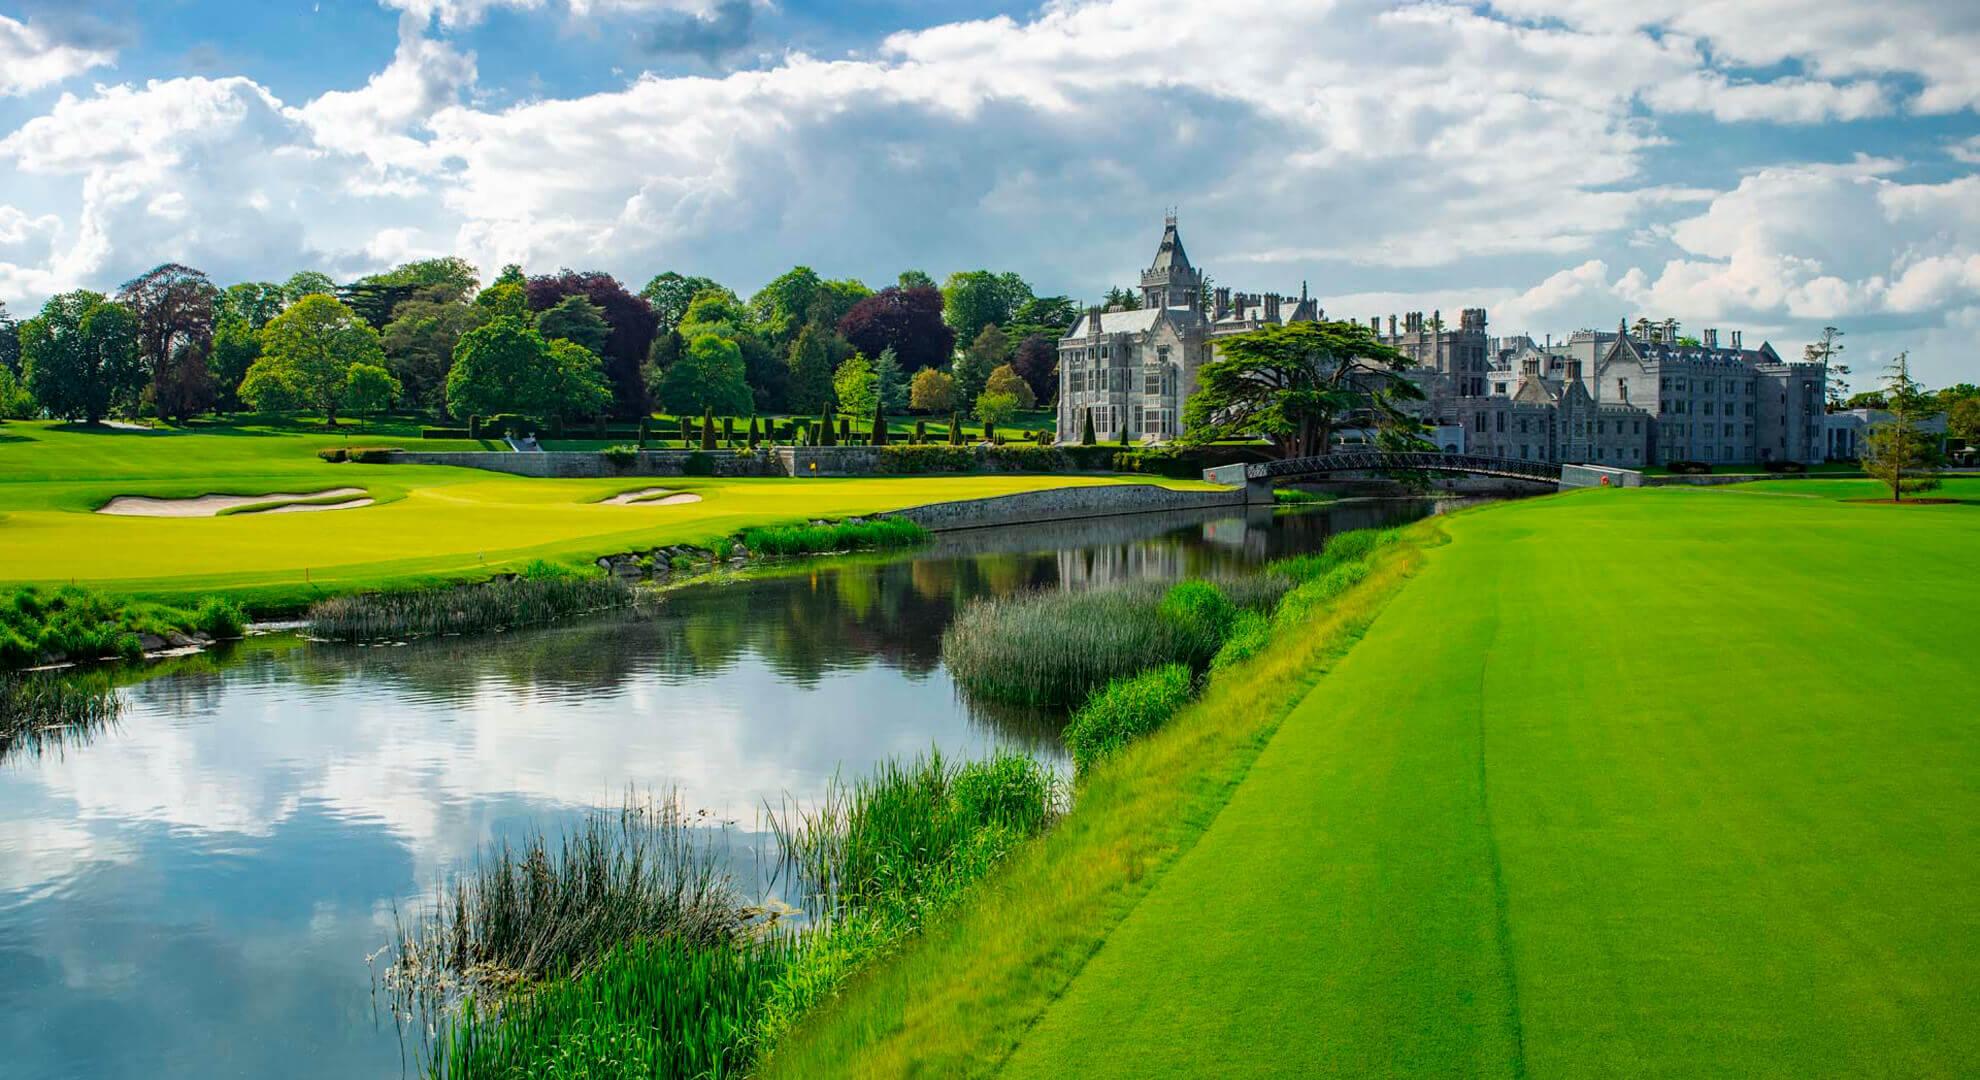 Adare Manor Golf Course, South & South West, Ireland